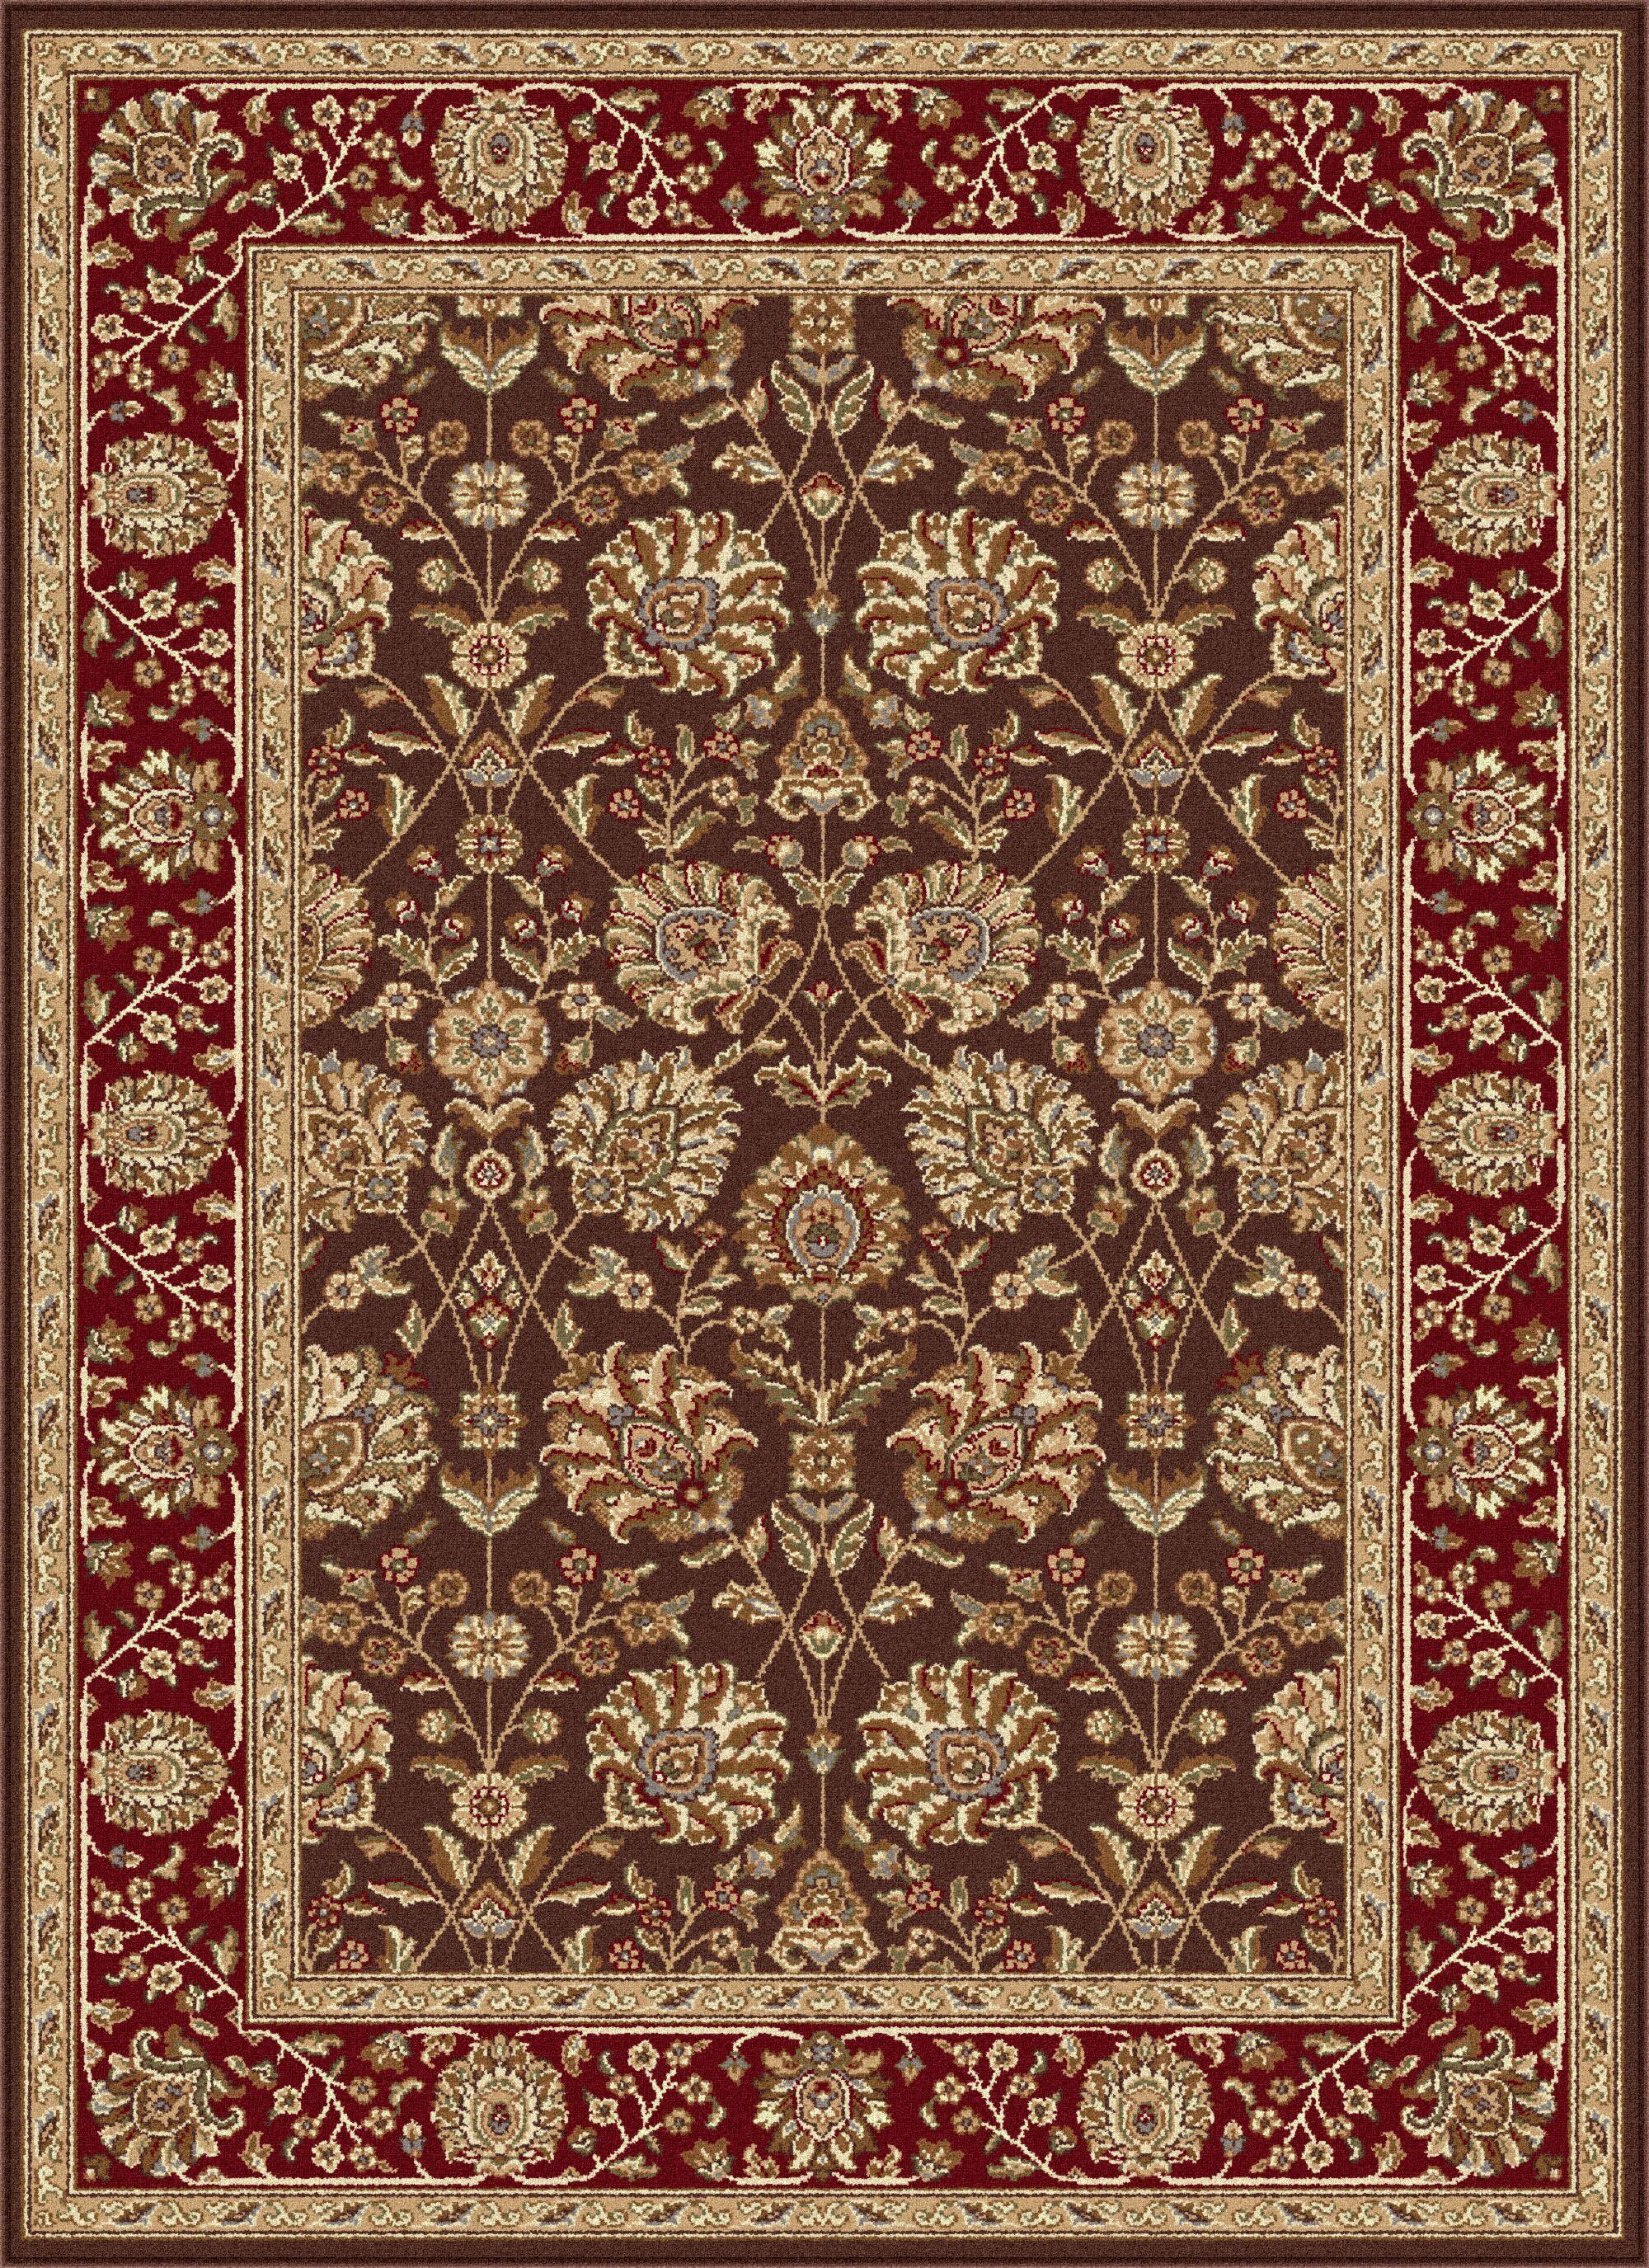 Langlee Brown/Red Area Rug Rug Size: 7'6'' x 9'10''